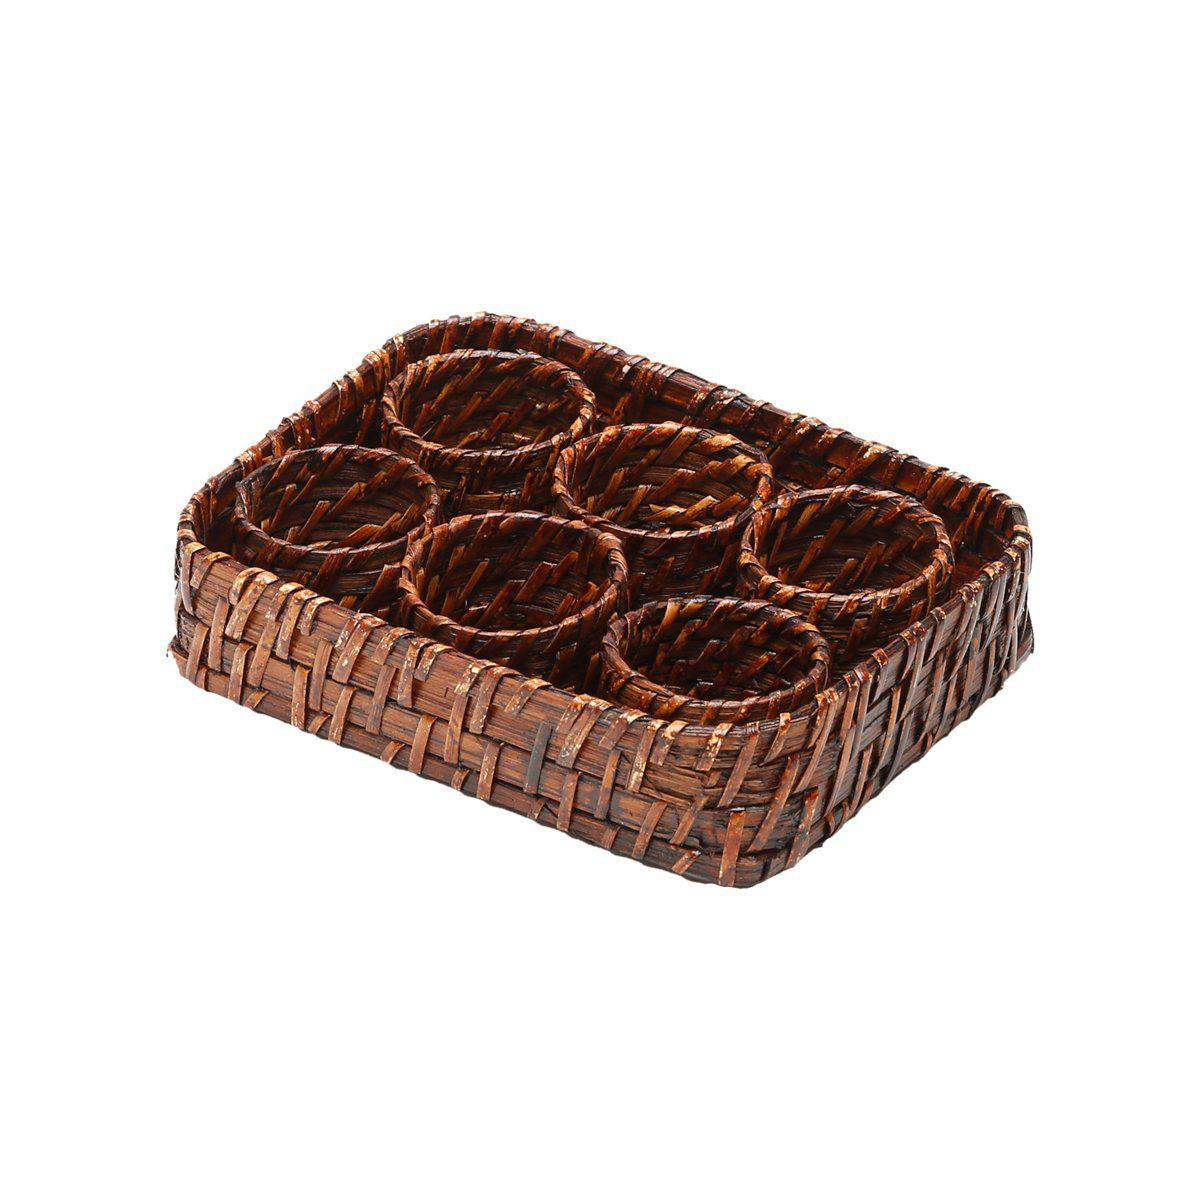 Conjunto 6 anéis para guardanapo de rattan com bandeja Bon Gourmet - 1062